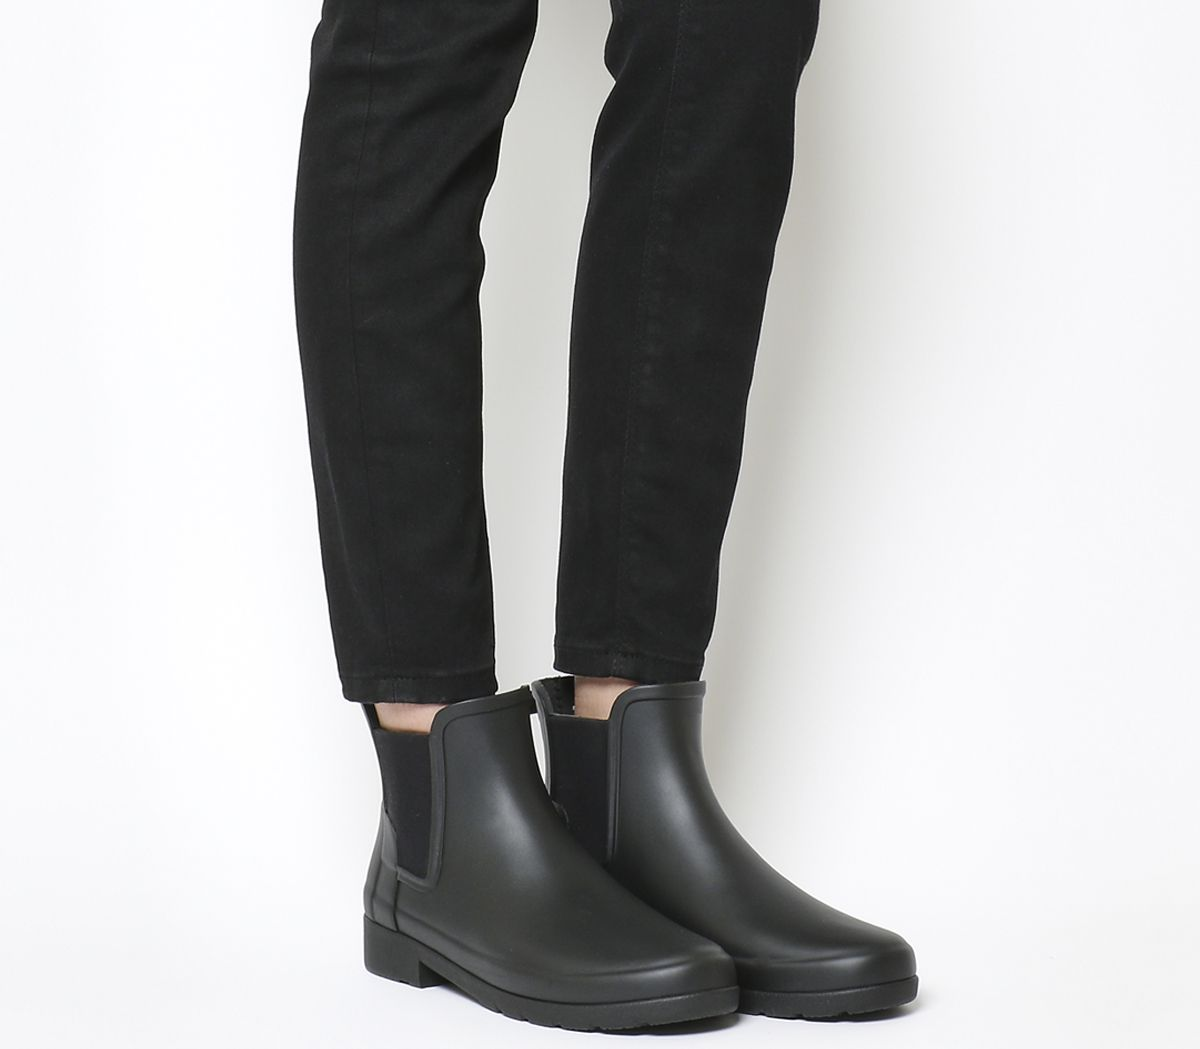 san francisco 288fa 037ff Hunter Original Refined Chelsea Black Matte - Ankle Boots